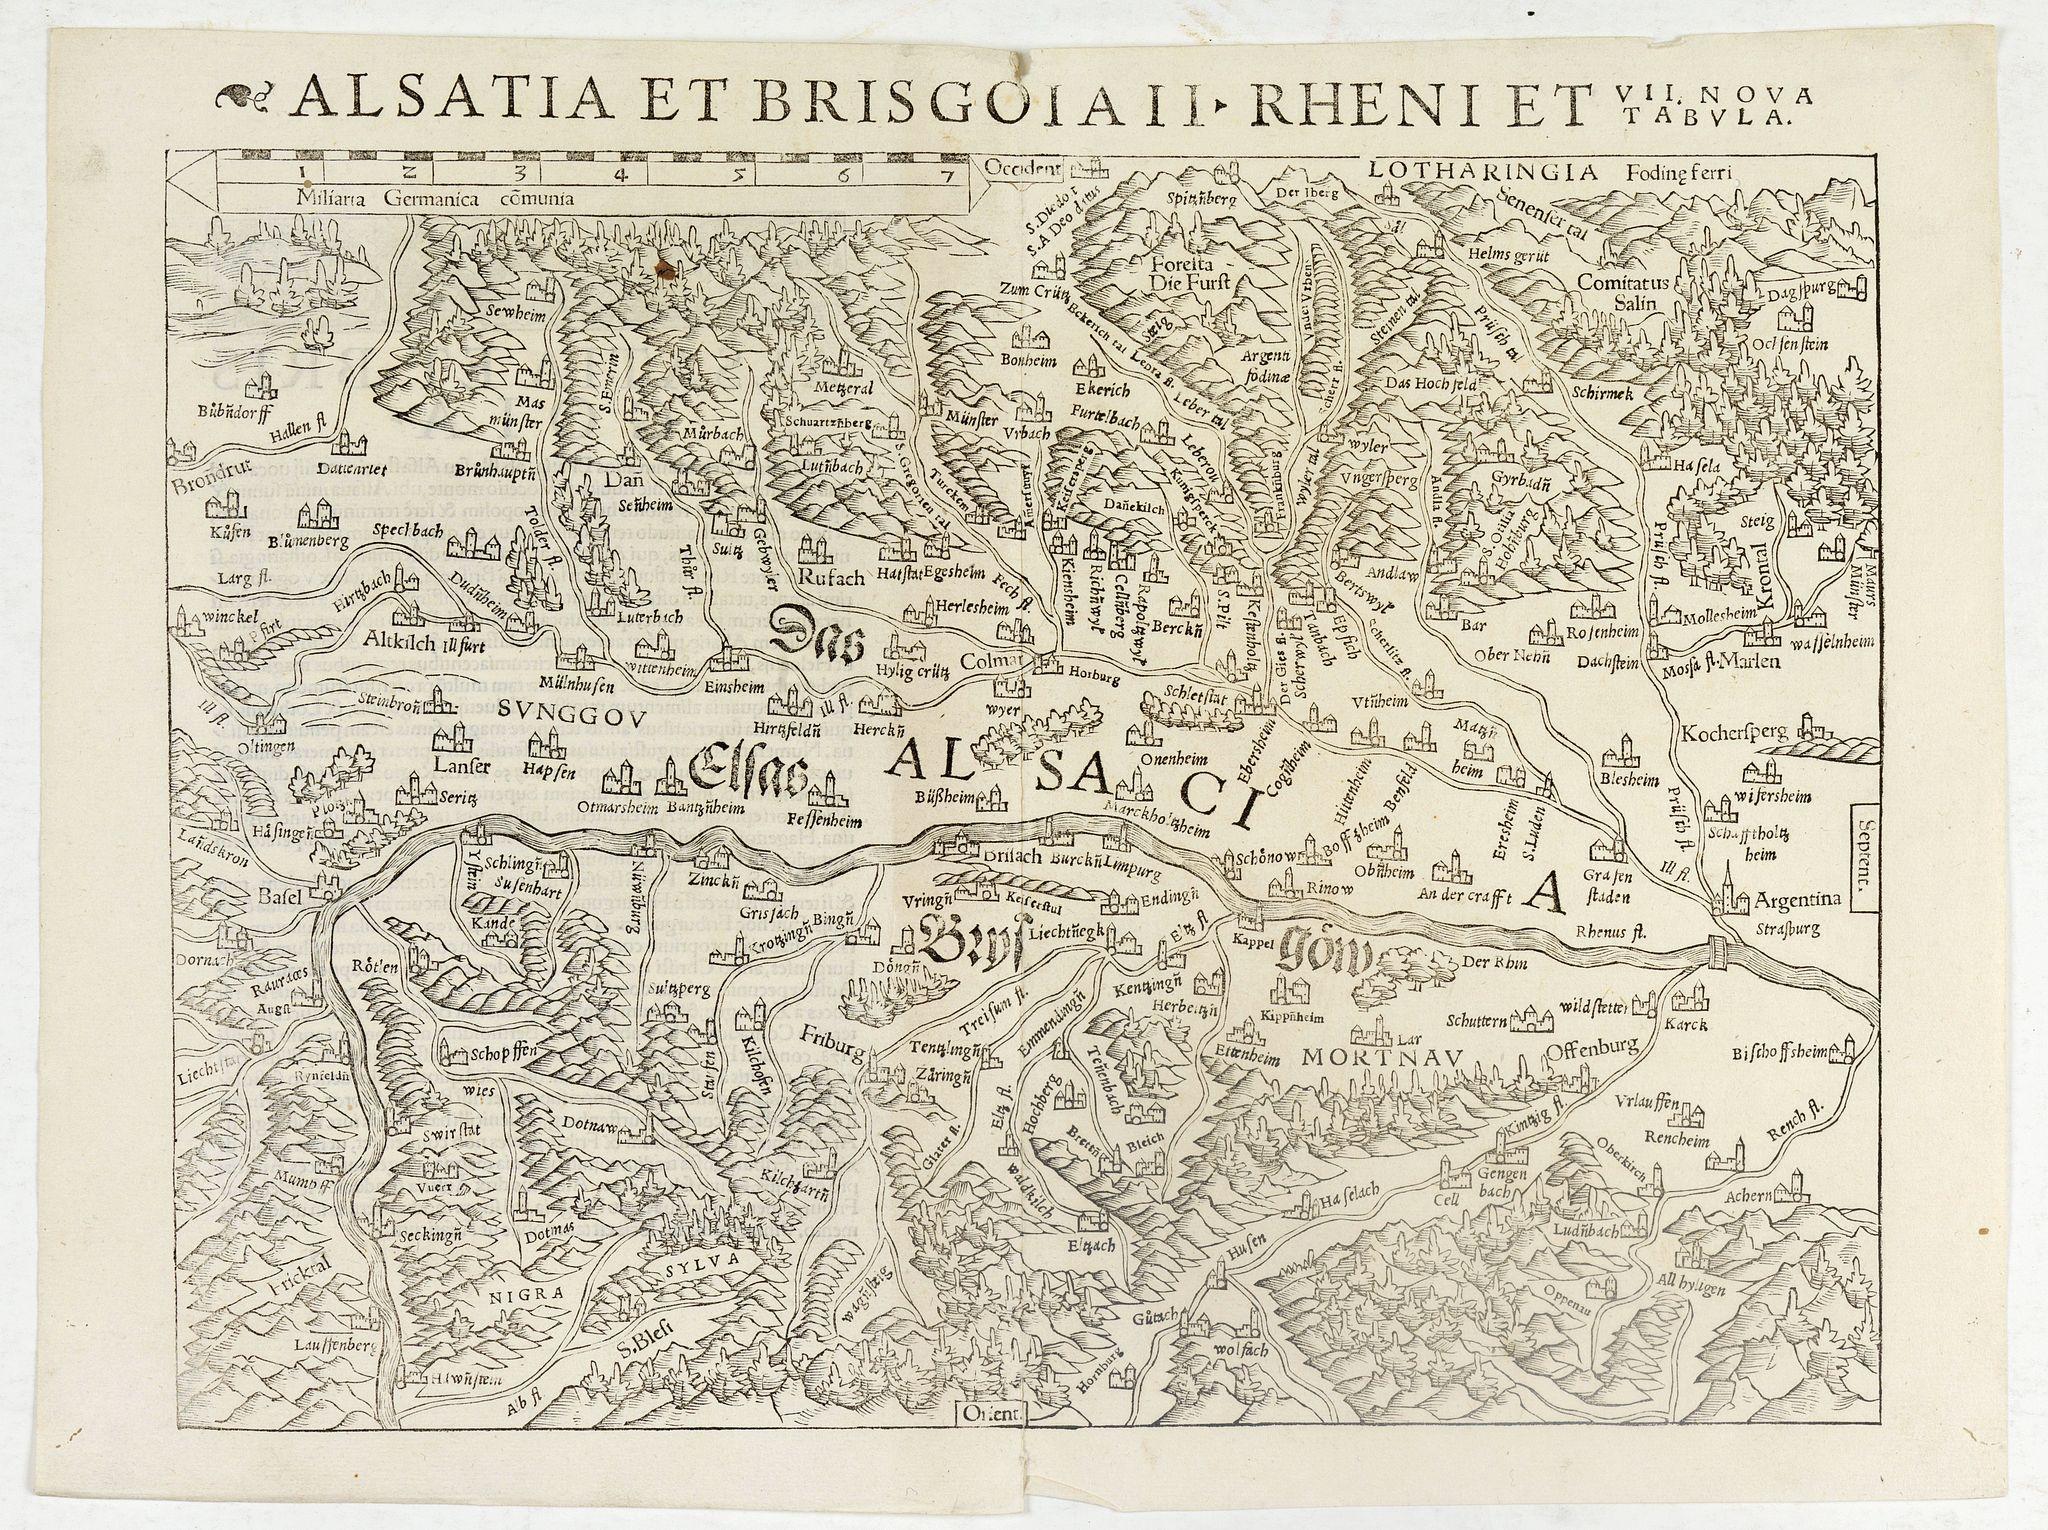 MÜNSTER, S. -  Alsatia et Brisgoia II Rheni Et VII Nova Tabula.